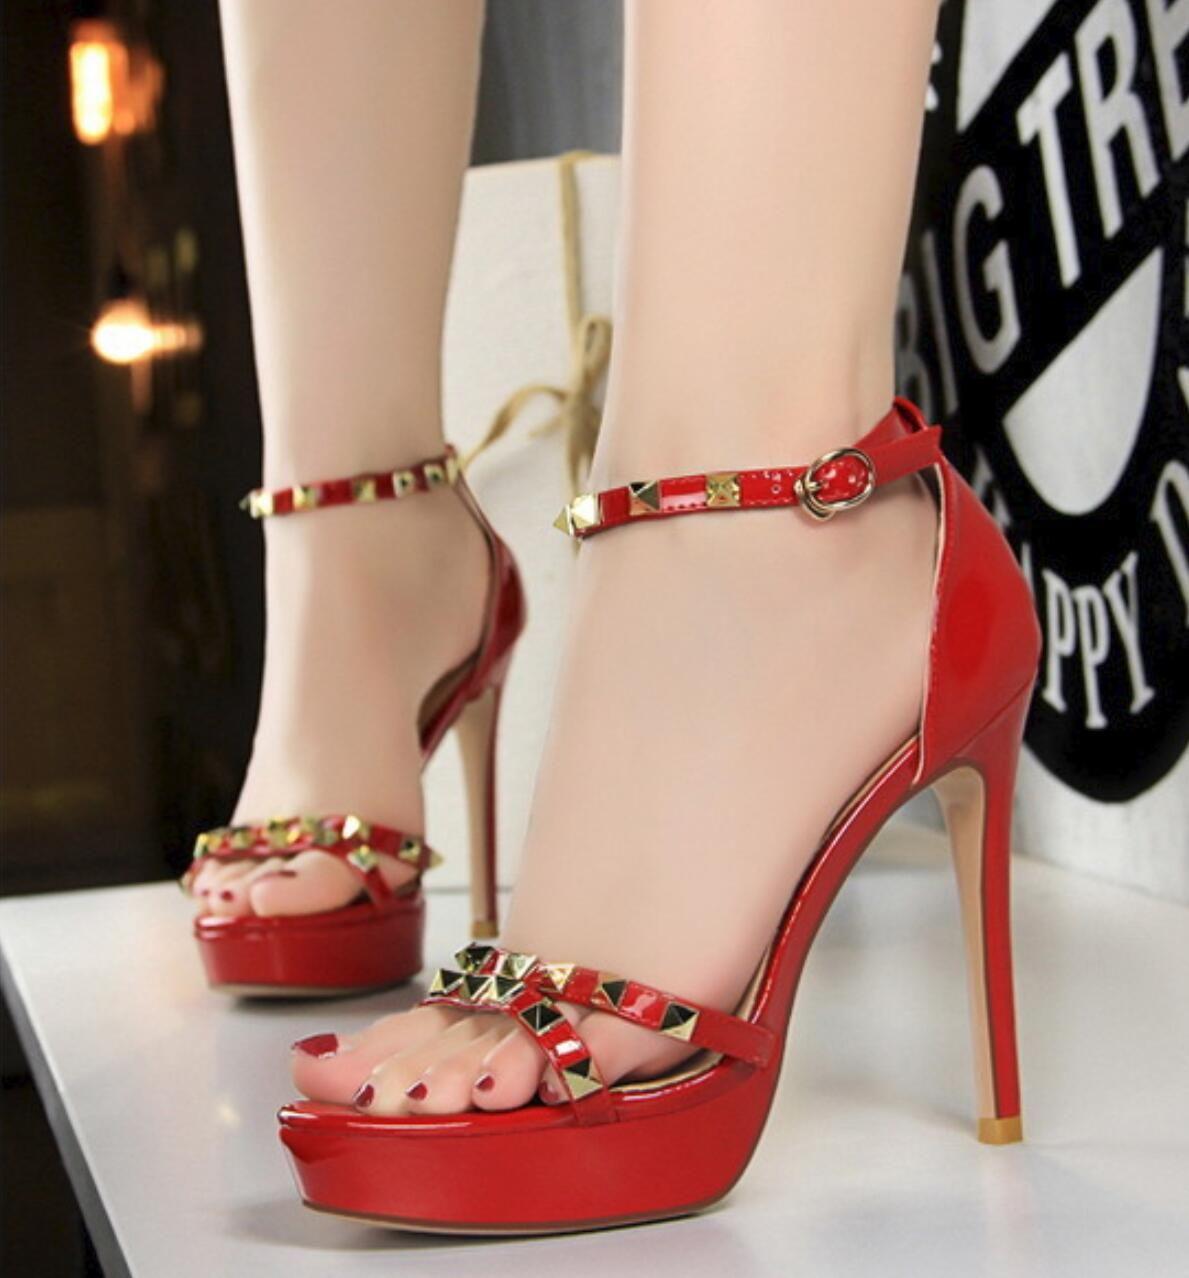 9abff0316 Women Patent Leather High Heels Rivet Platform Pumps Open Toe Sexy Sandals  Buckle Strap Stilettos Party Wedding Club Shoes XW72 Platform Shoes Prom  Shoes ...